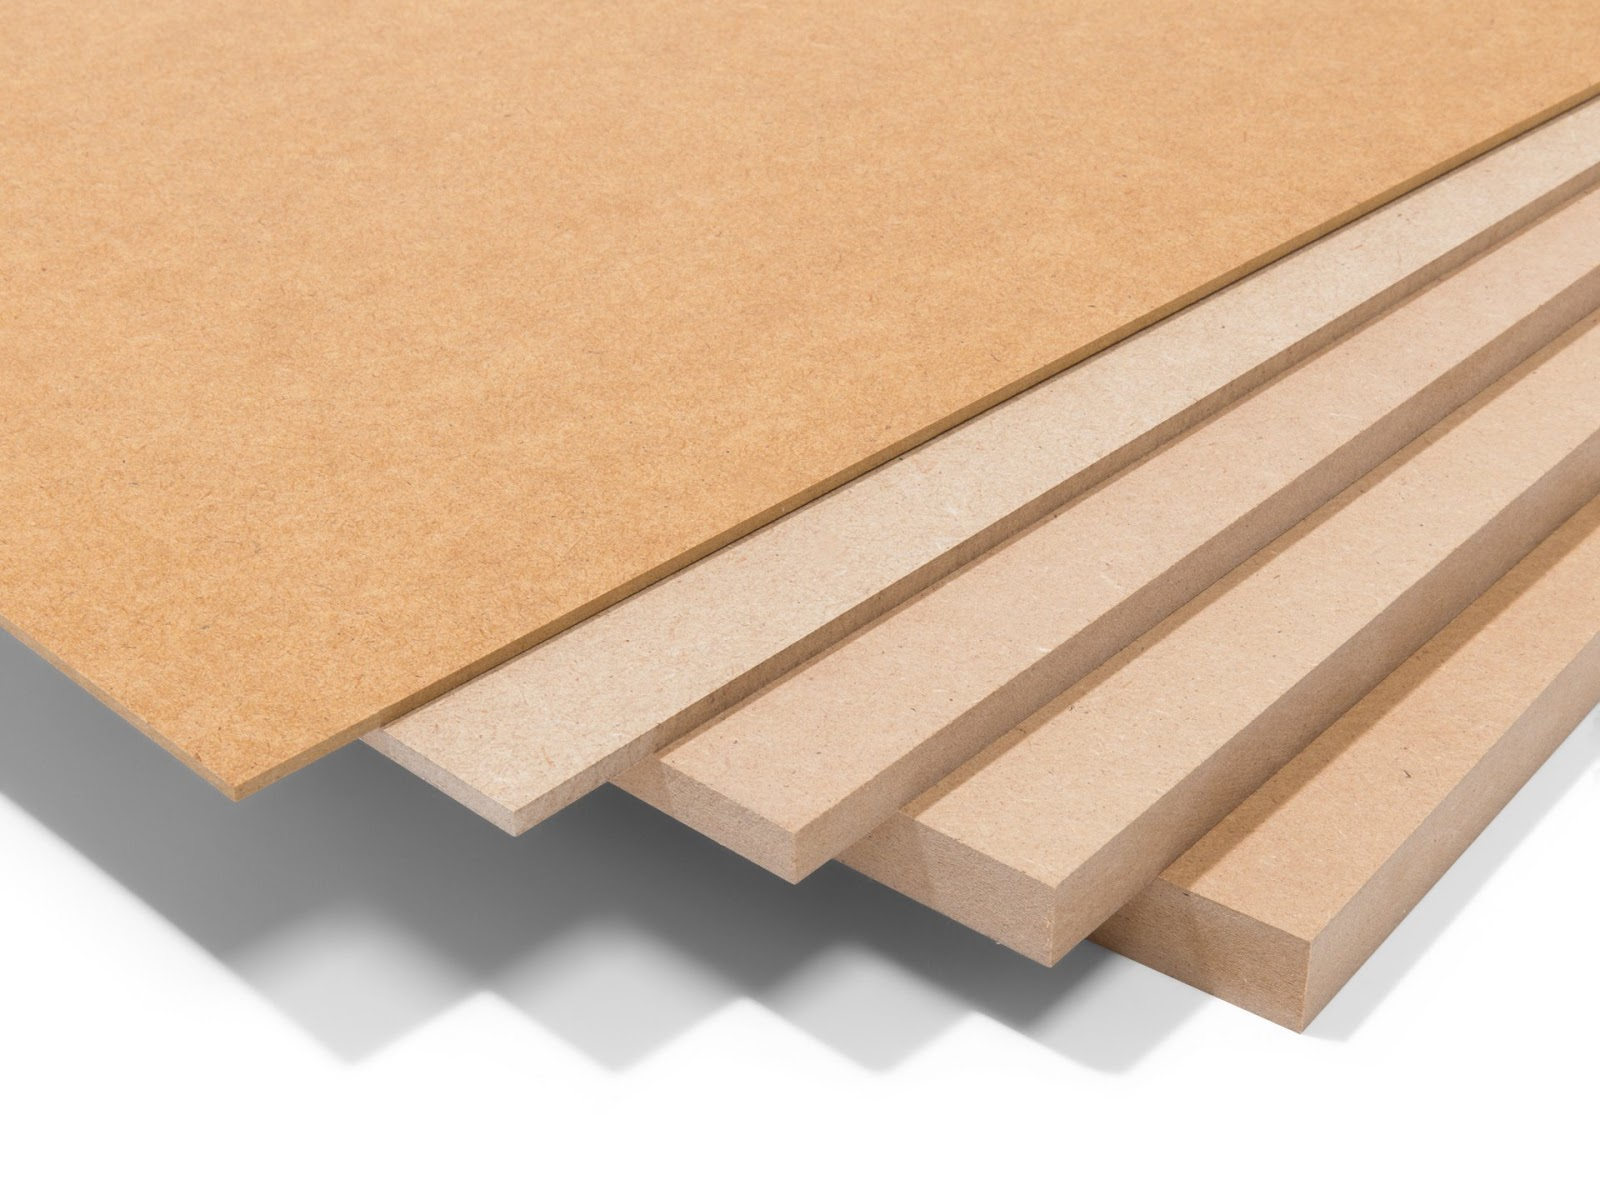 МДФ-панели, толщина 25 мм, размер 2800×2070 мм, Кастамону, F